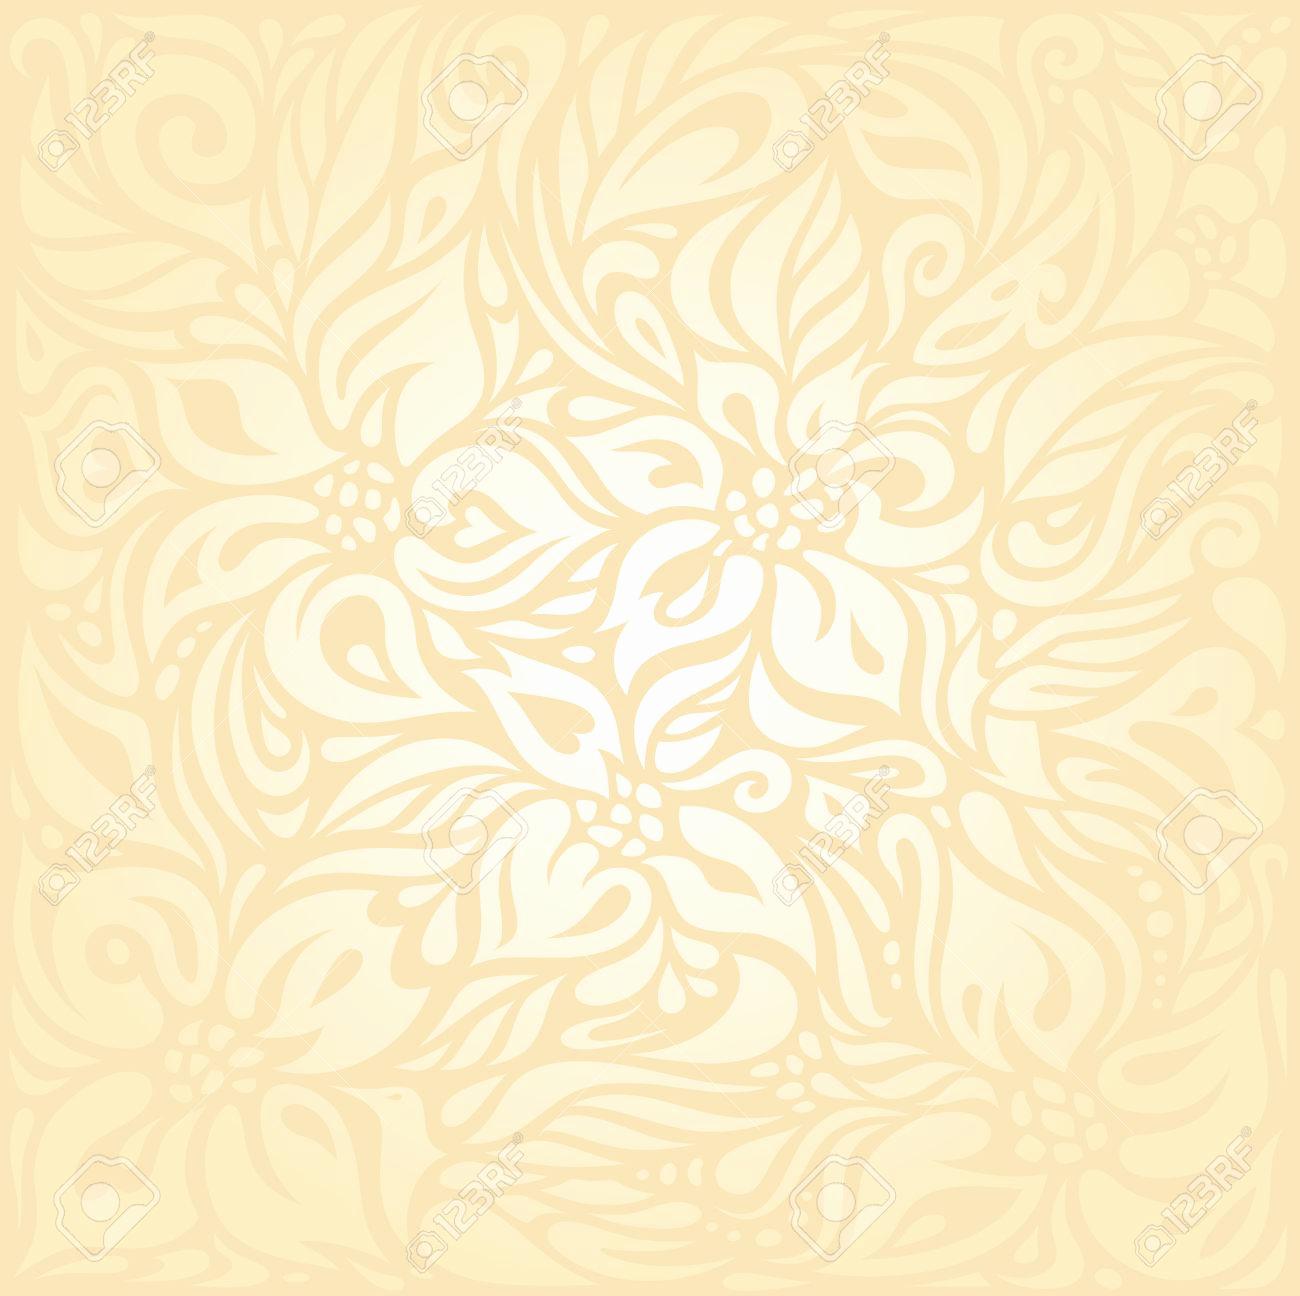 Wedding Invitation Background Designs Elegant Background for An Invitation